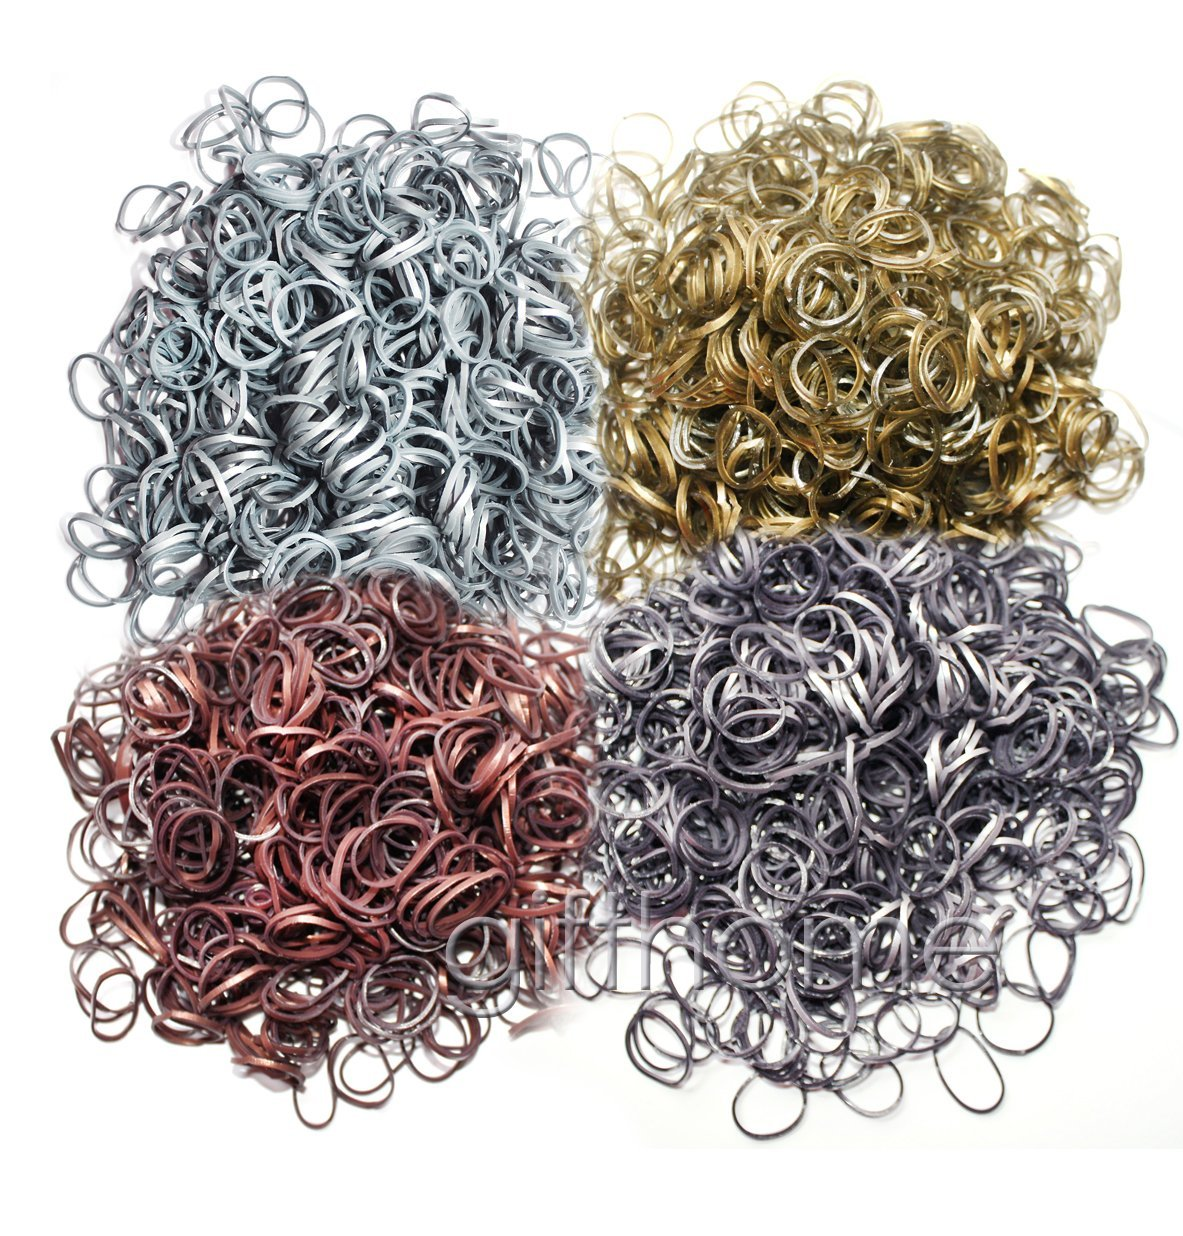 Metallic Gold Silver Bronze Steel Gray Color Loom Bands